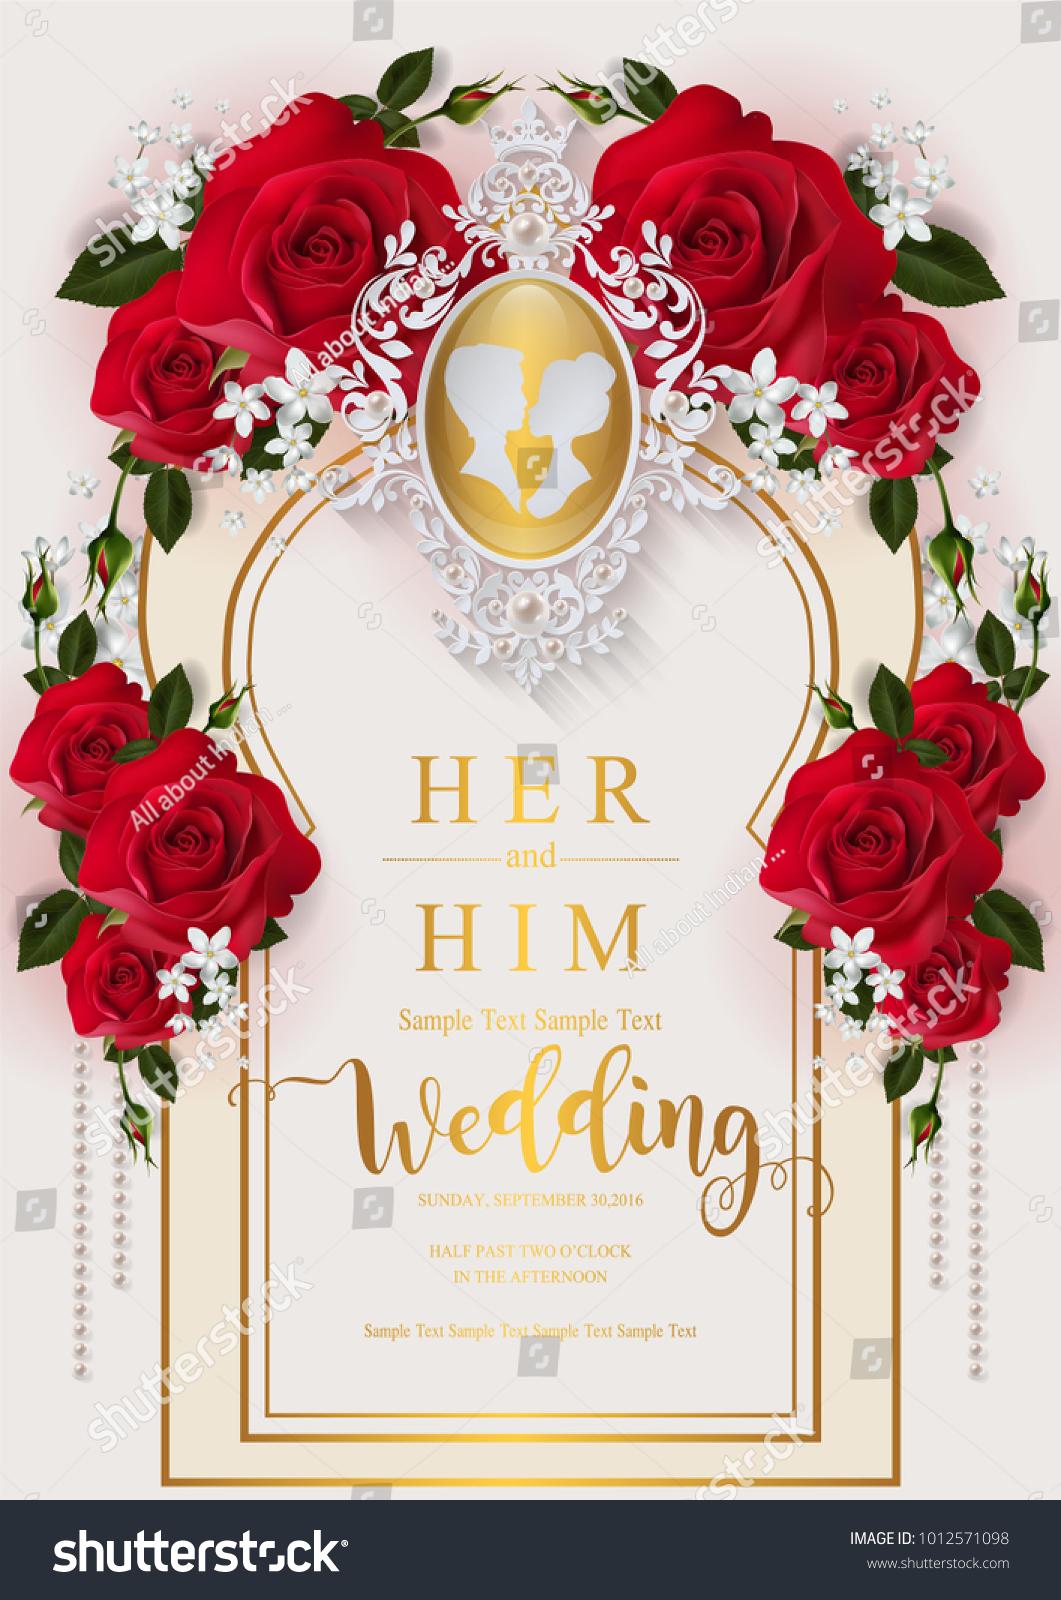 Wedding Invitation Card Templates Valentines Day Stock Vector ...